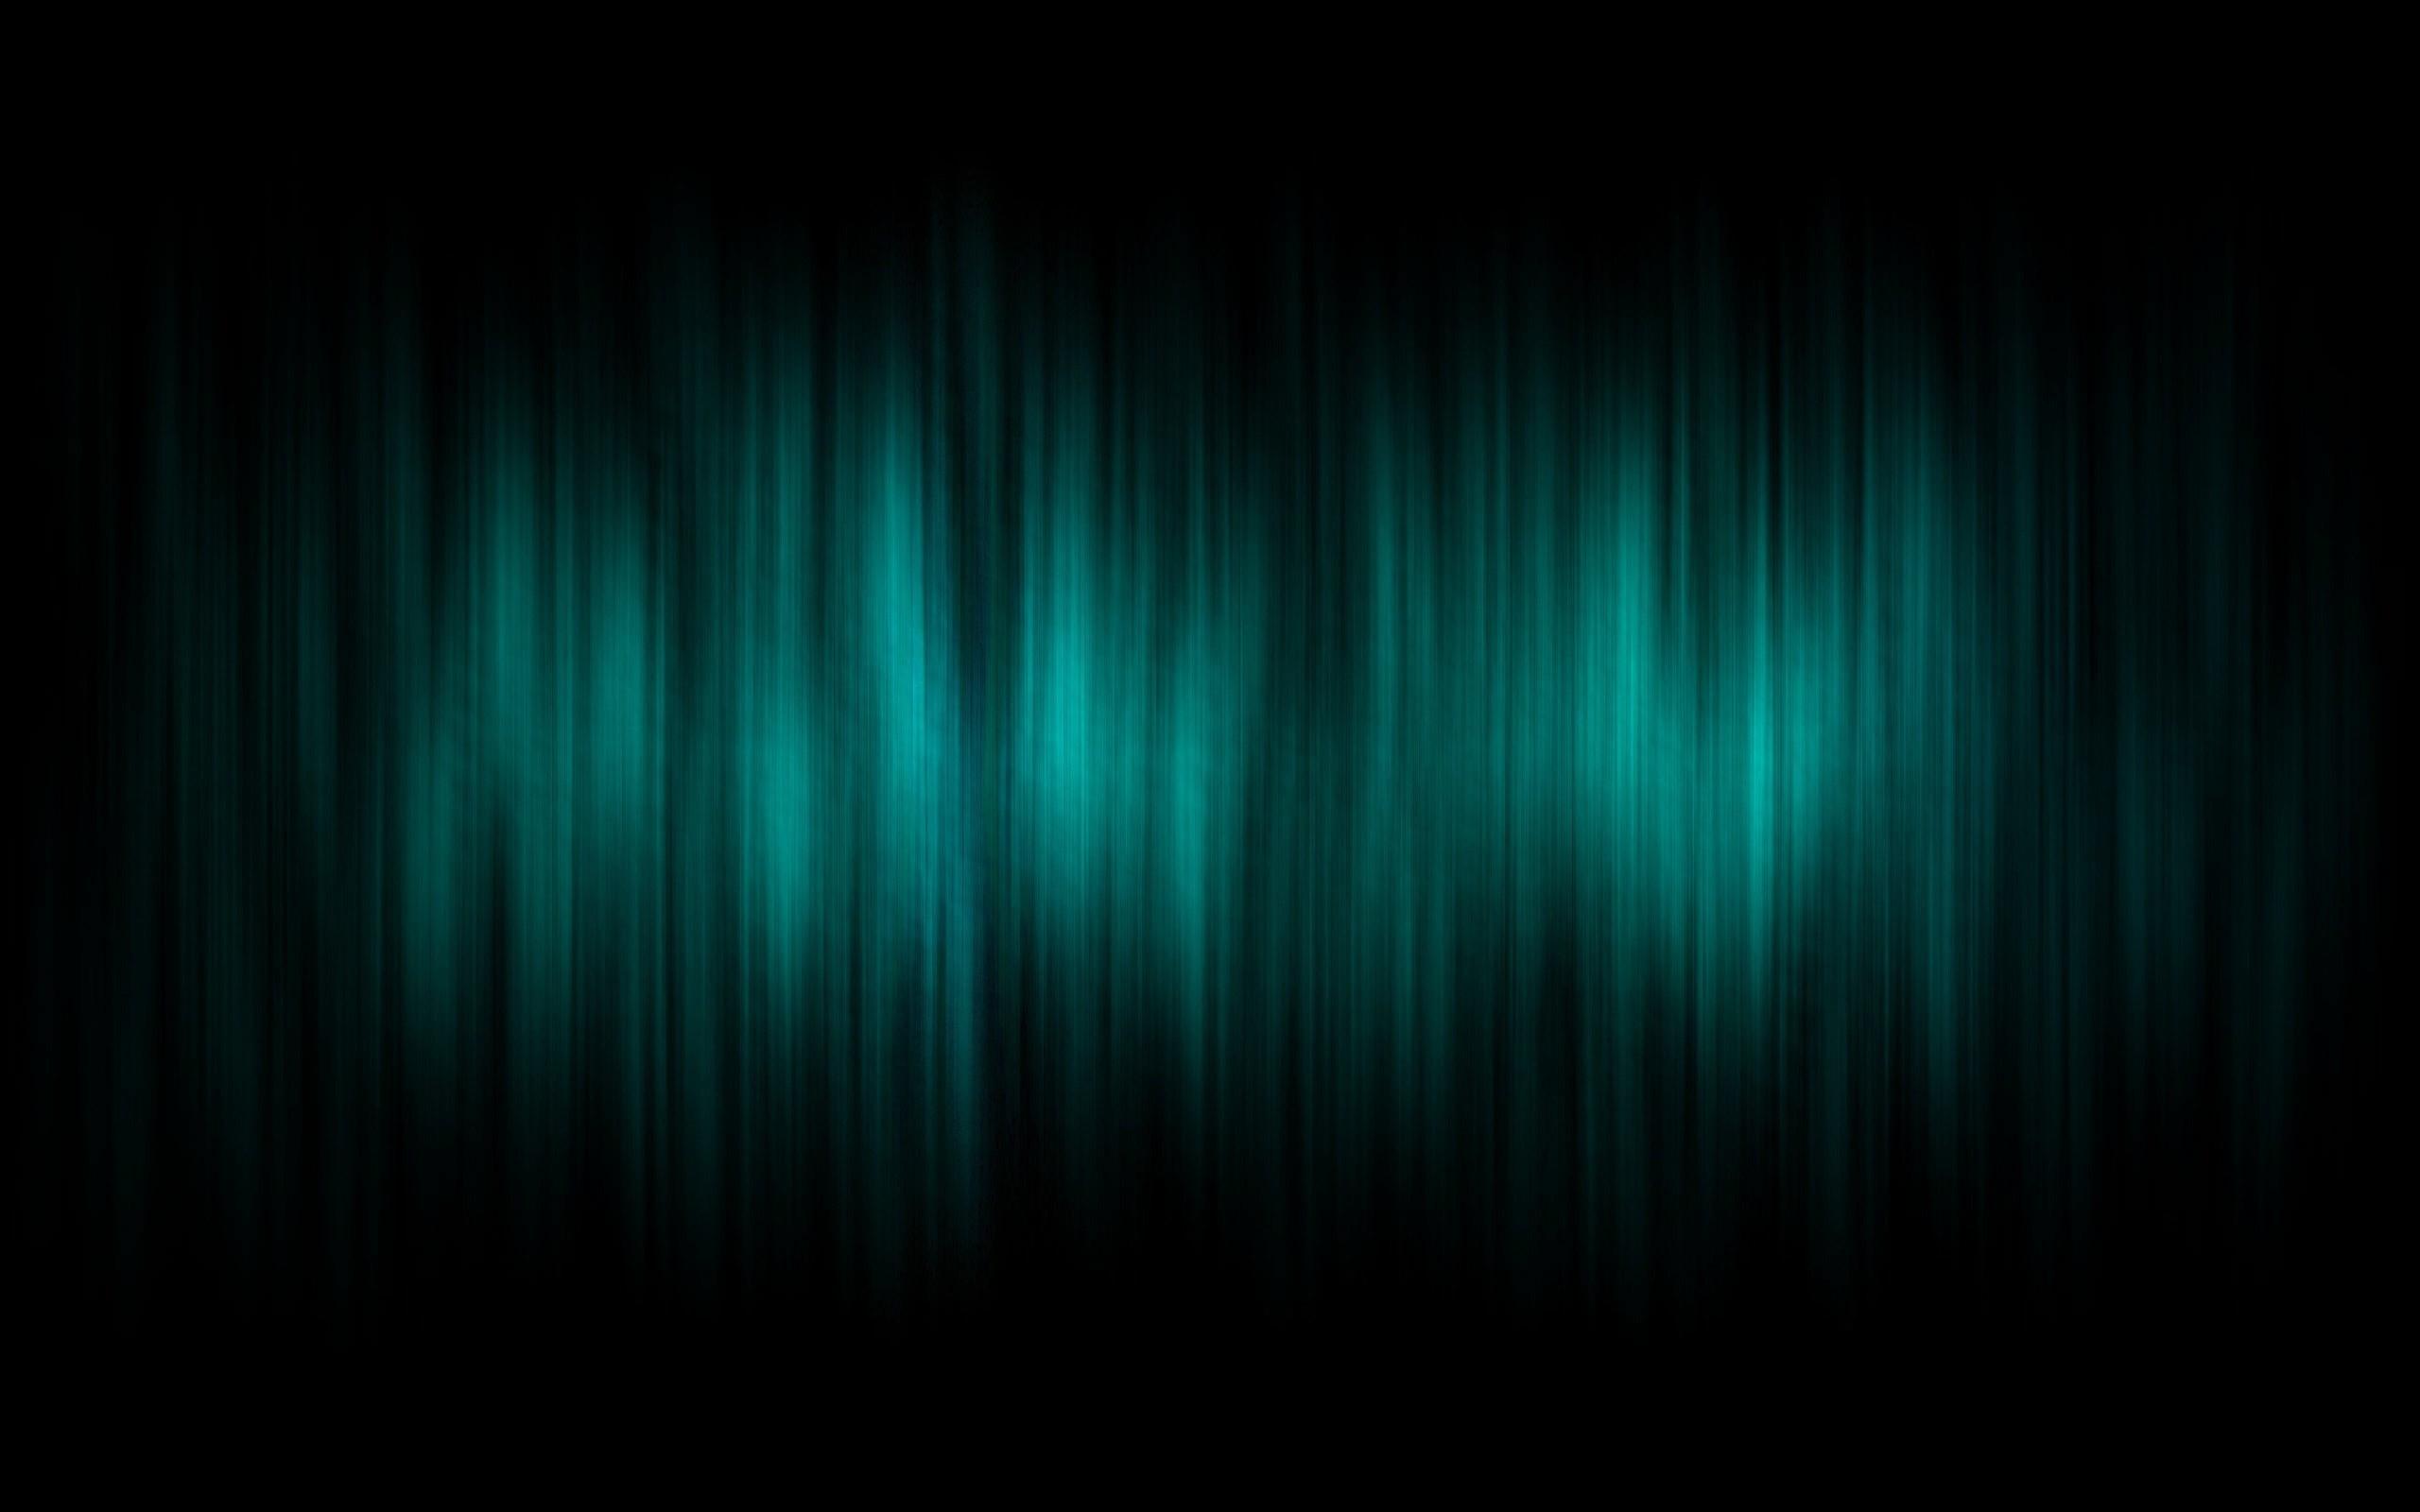 blue carbon fiber wallpaper hd abstract